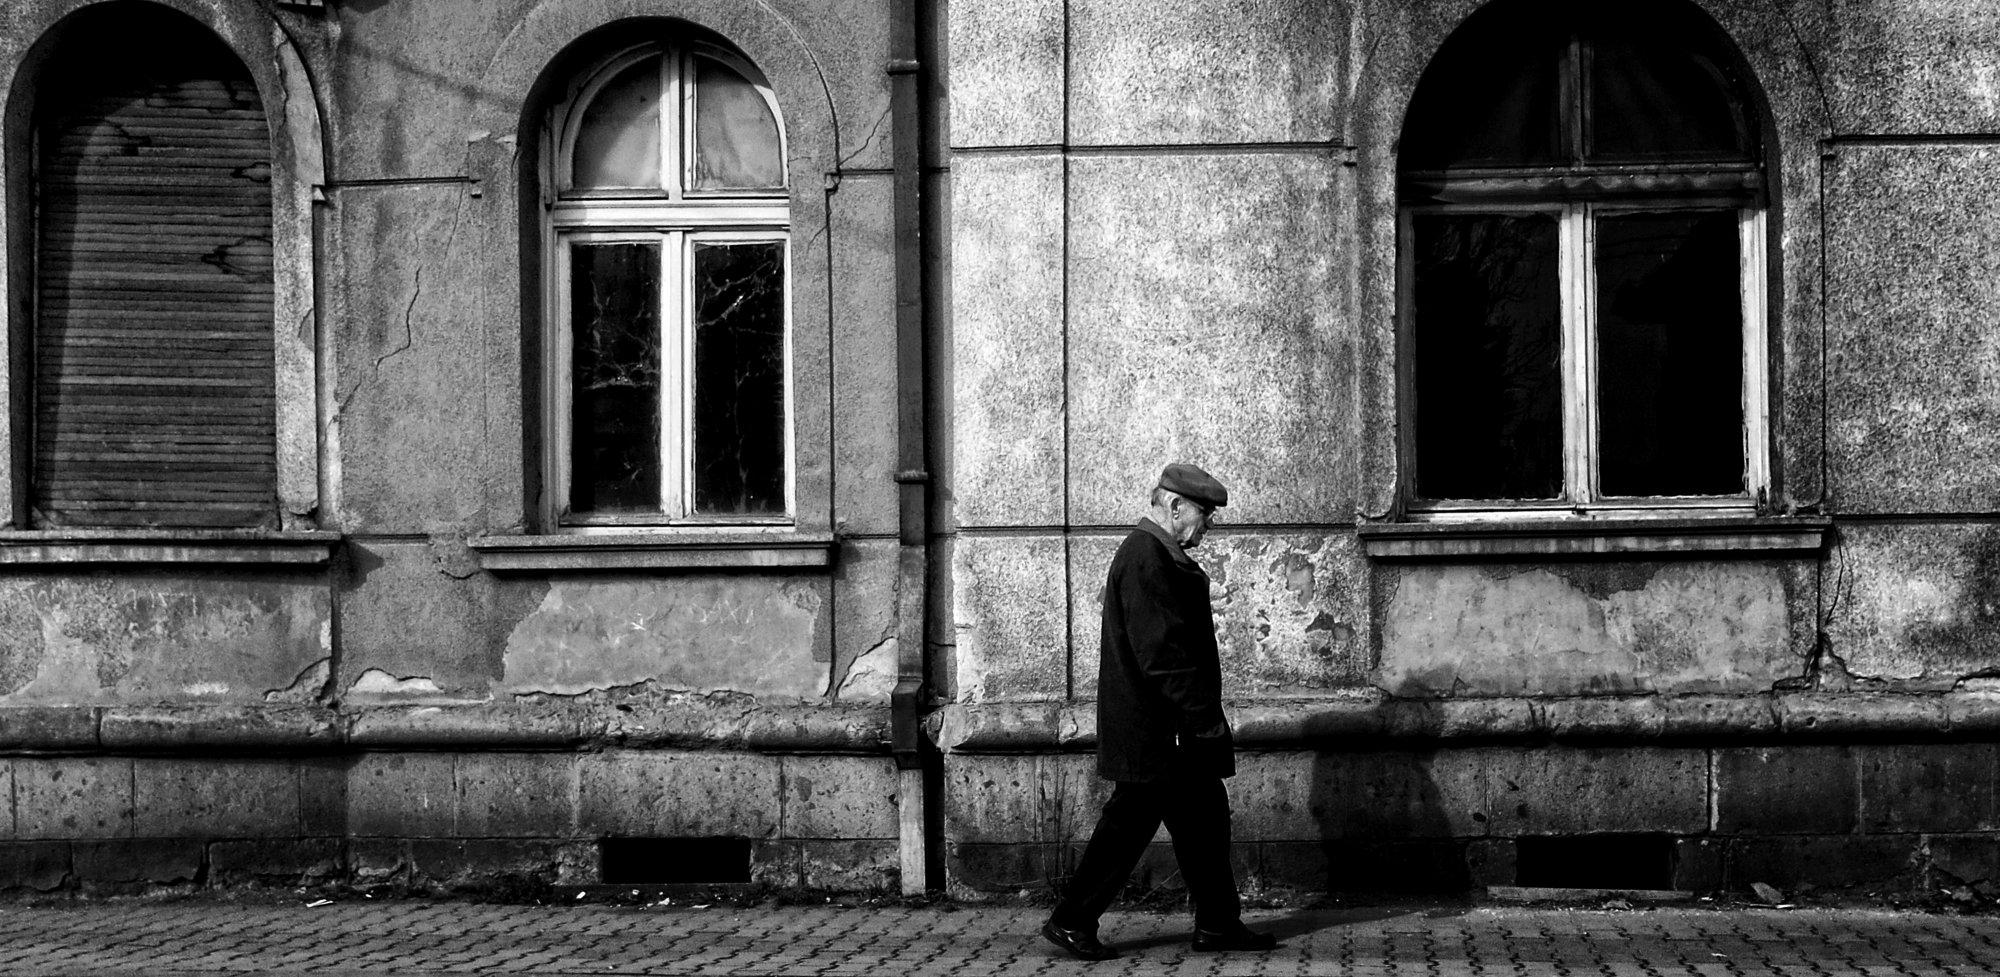 Shadows of Morning XXXVI